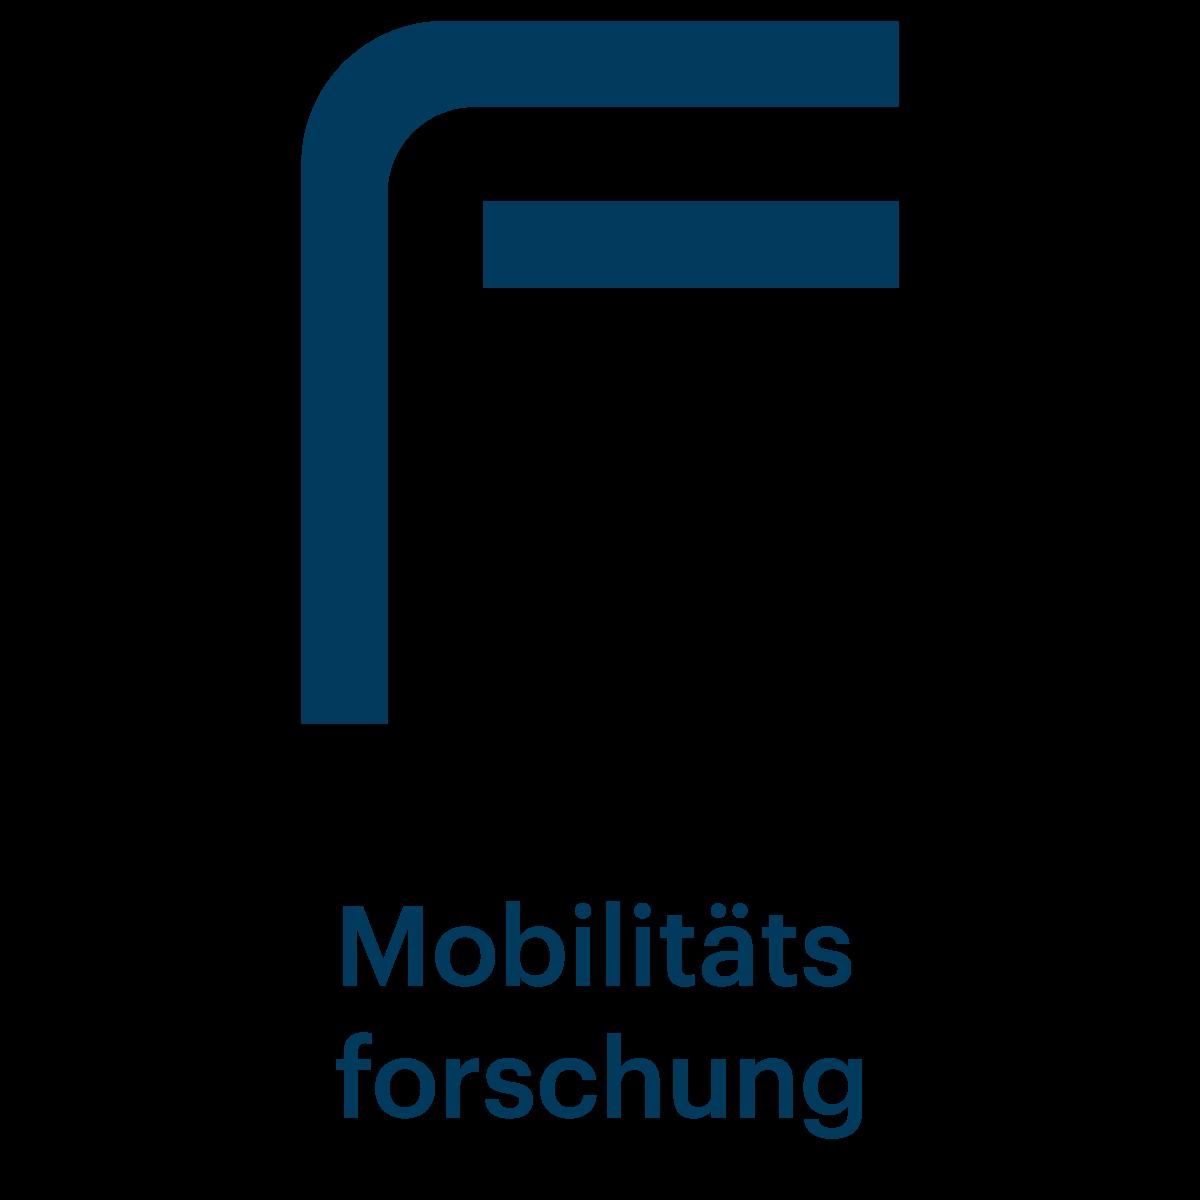 Mobilitaetsforschung